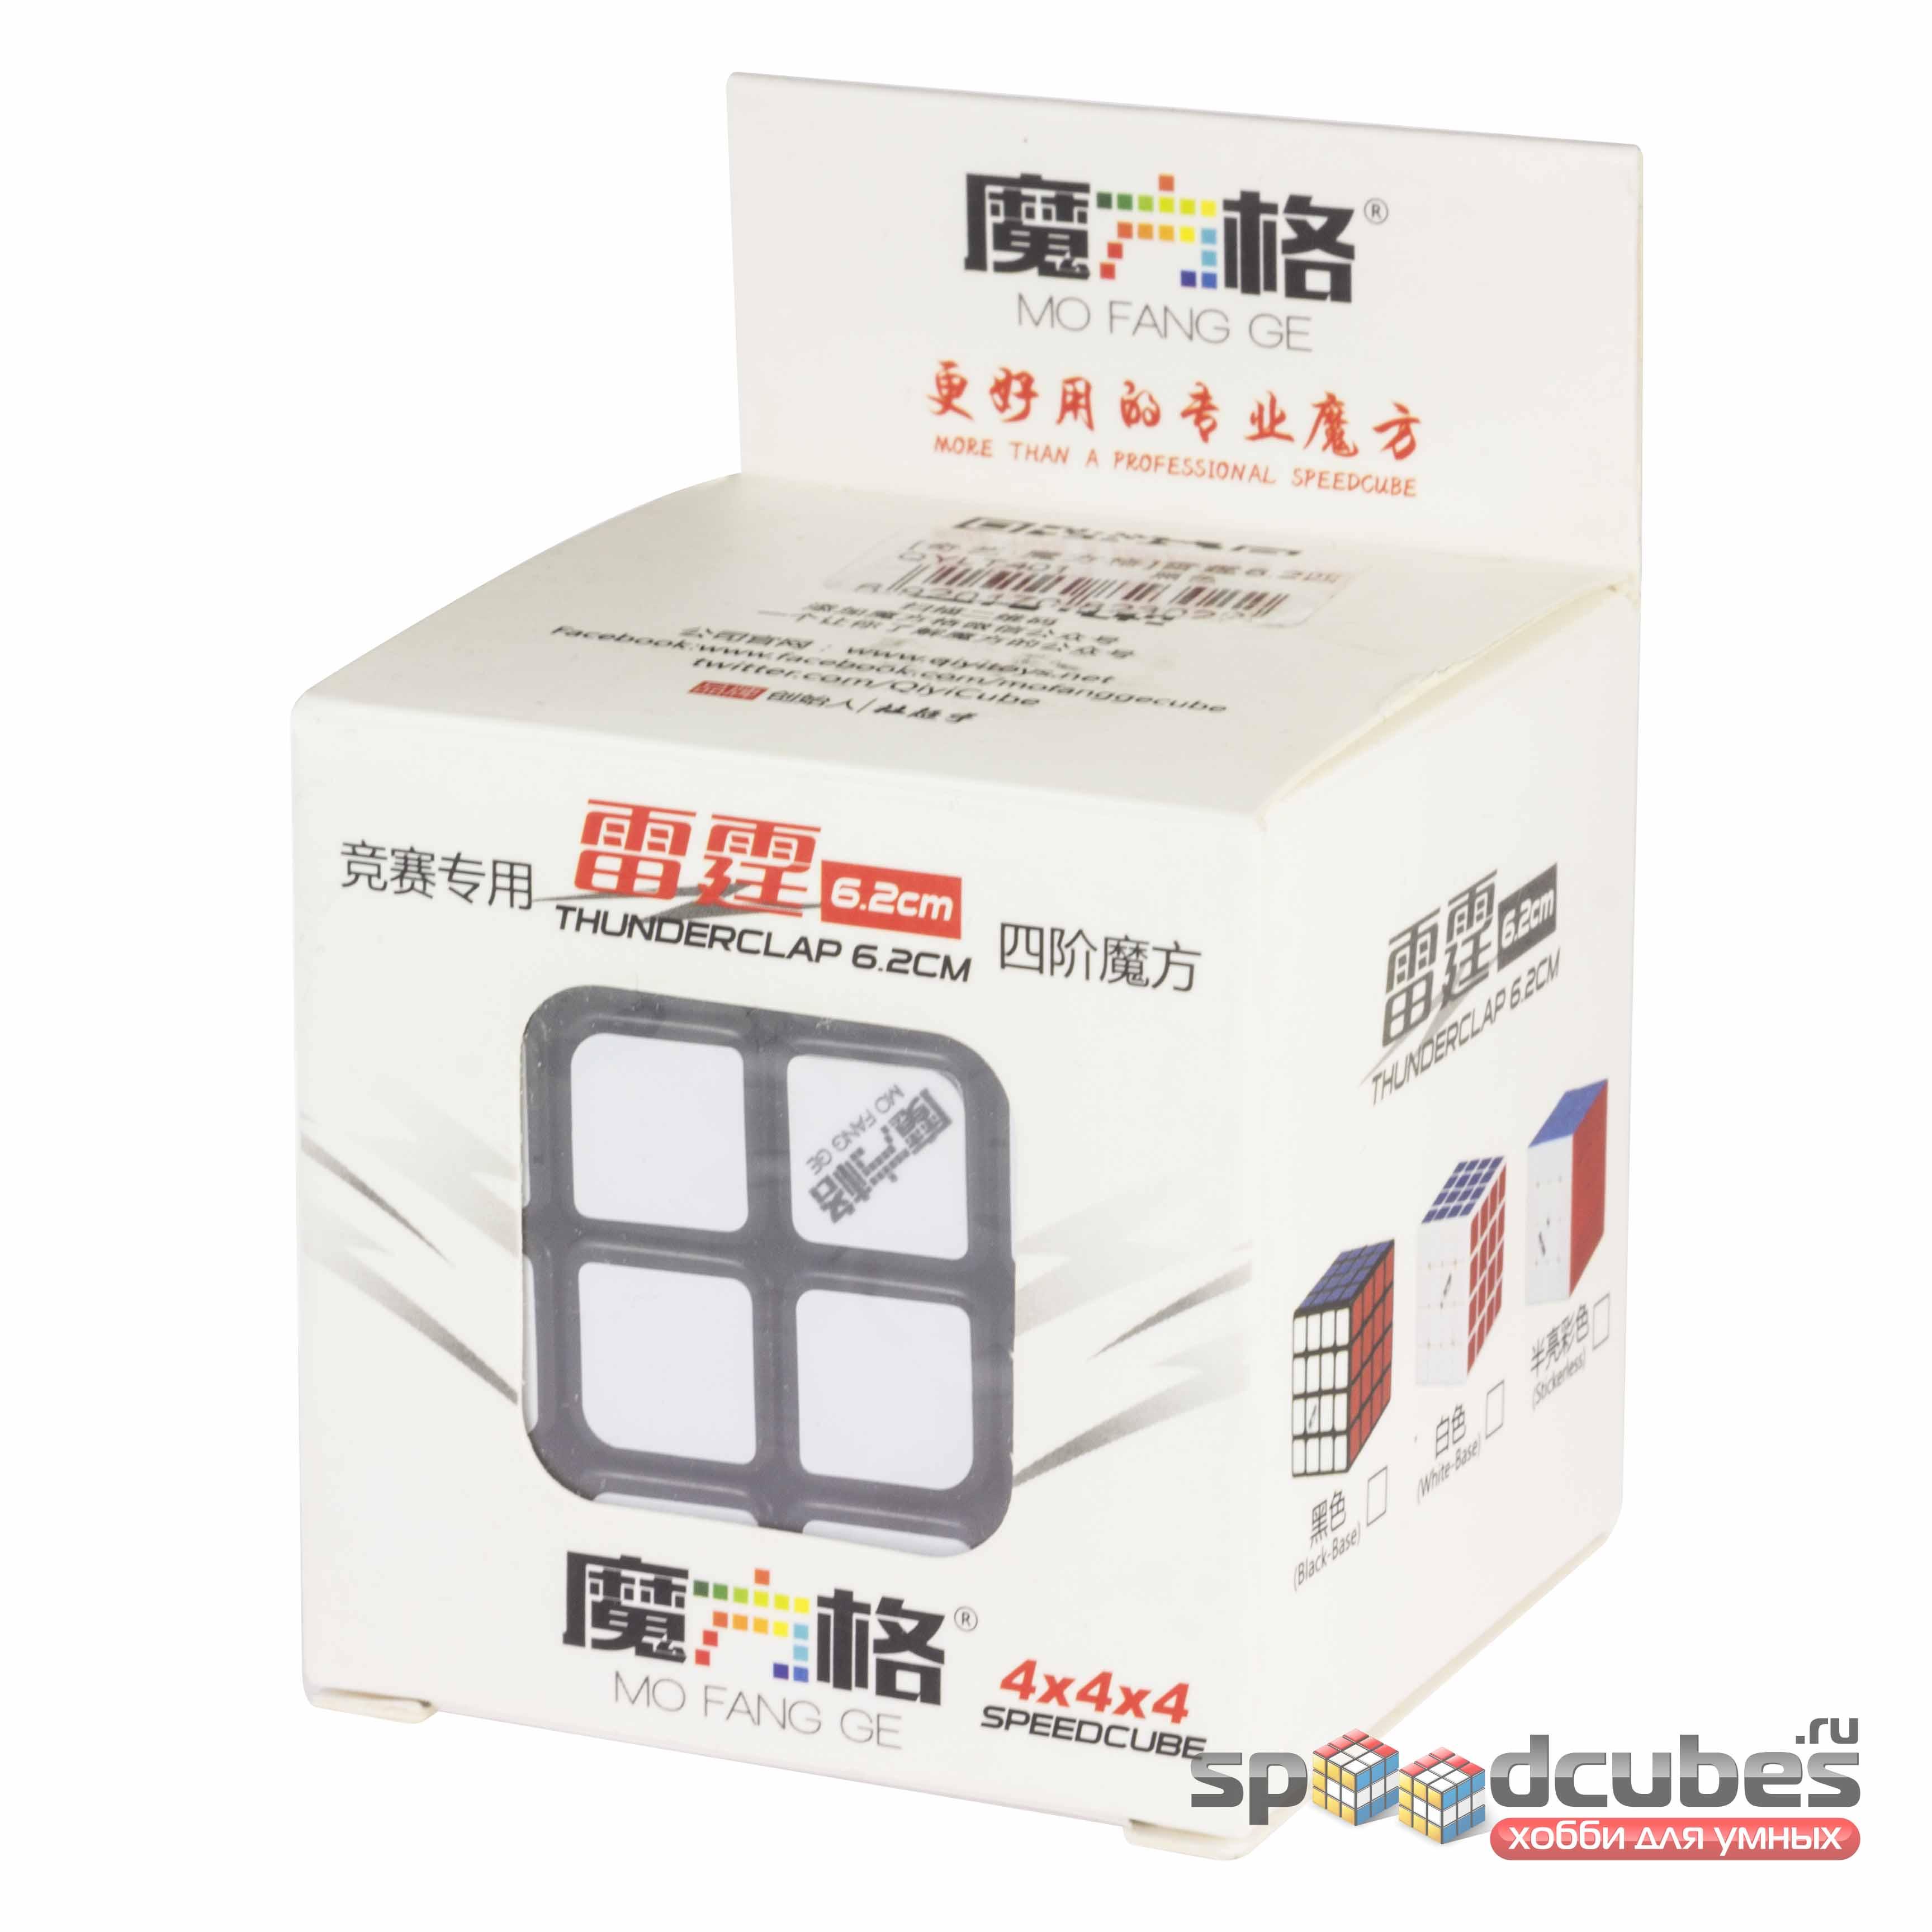 QiYi (MoFangGe) 4x4x4 Thunderclap 6.2 1